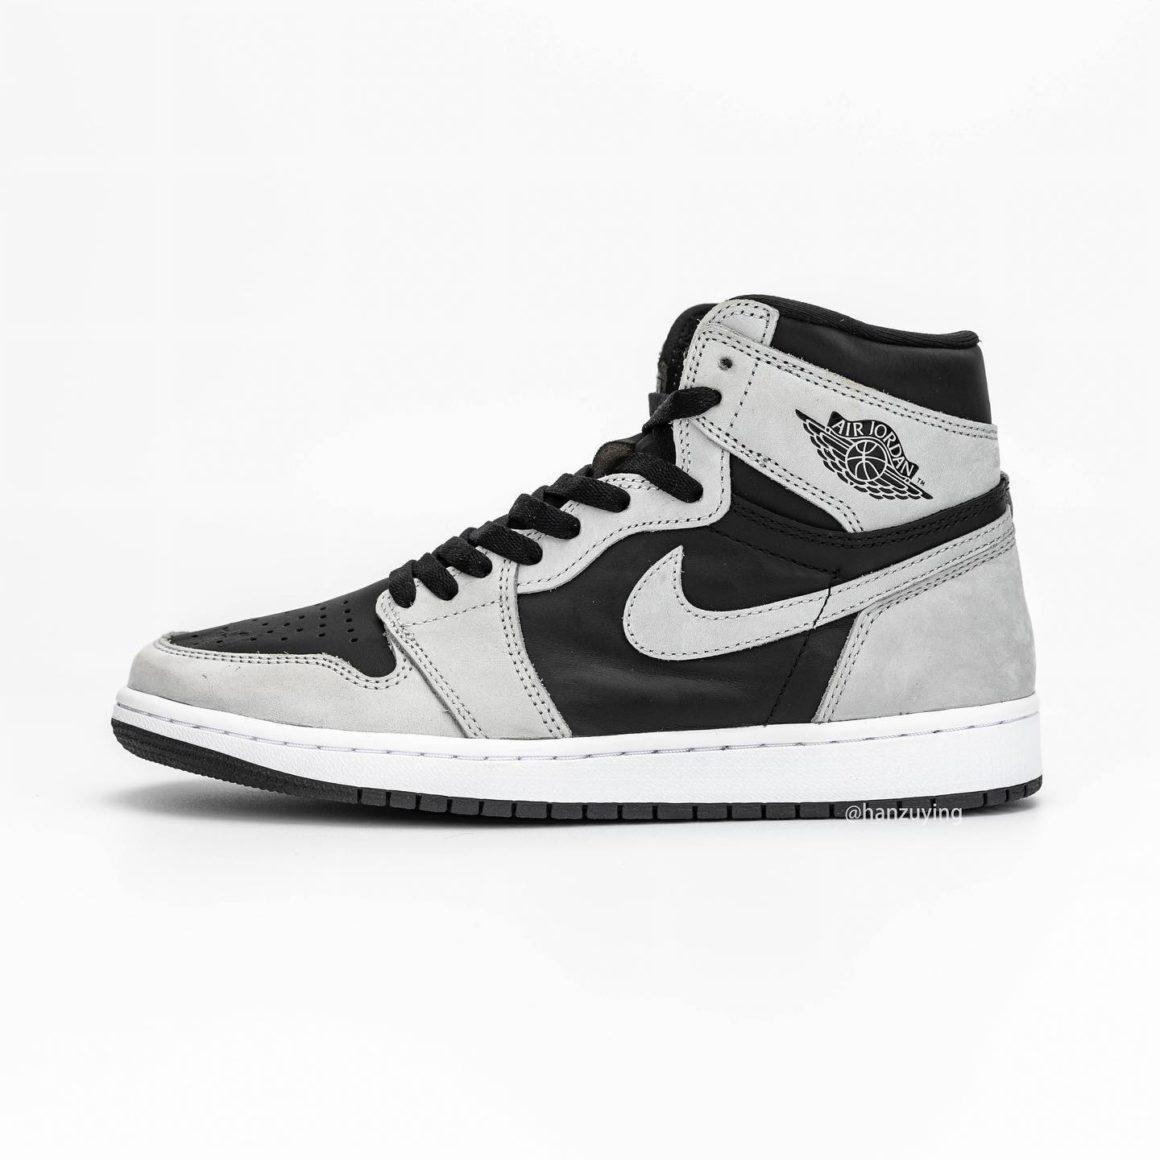 Air-Jordan-1-High-OG-Shadow-2.0-555088-035-Release